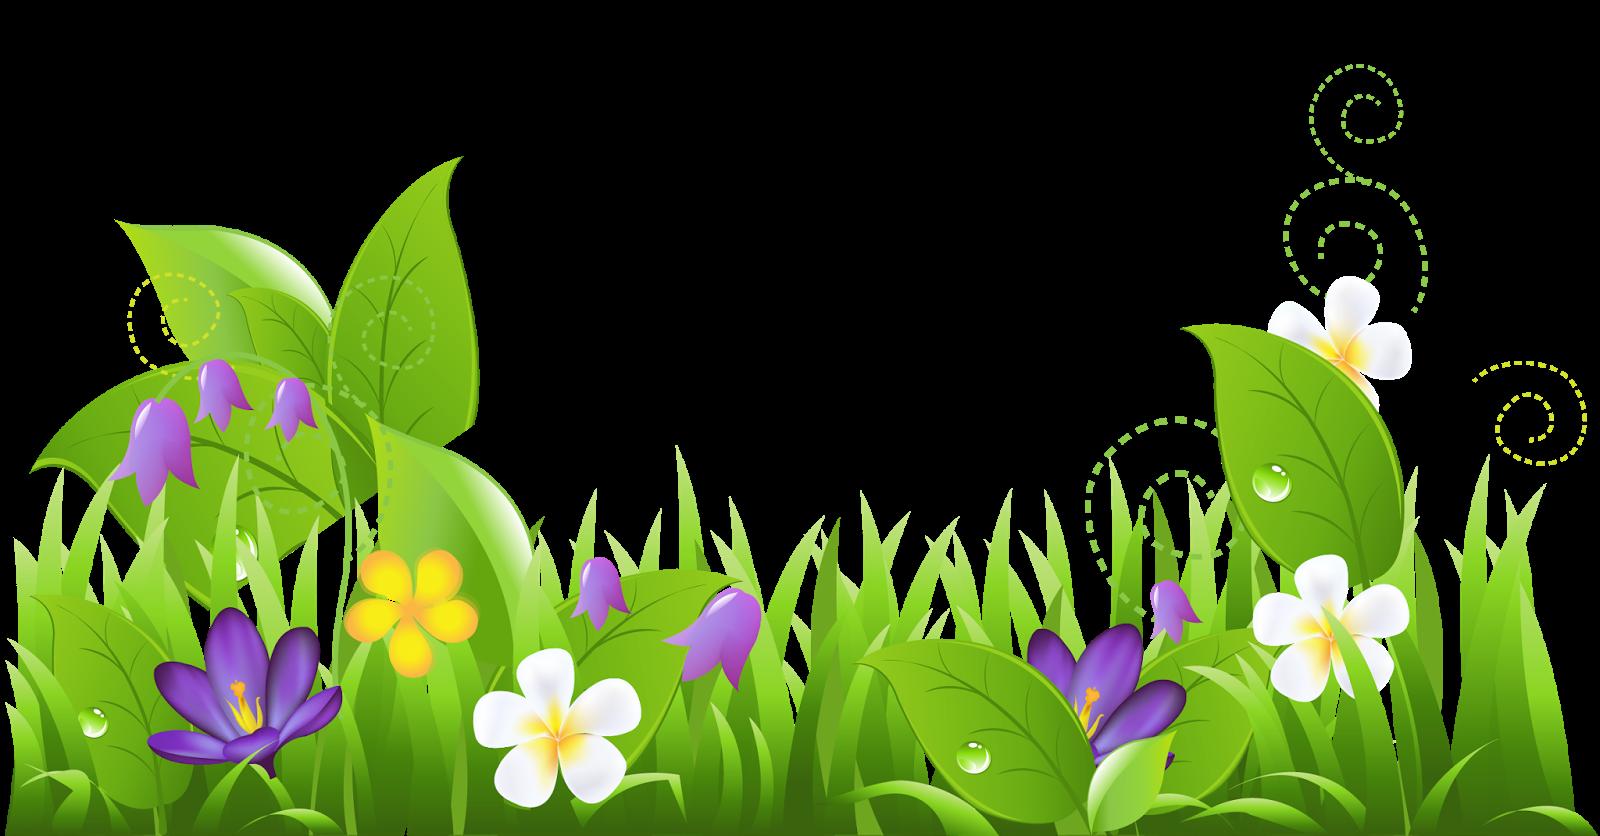 collection of transparent. Landscape clipart spring season